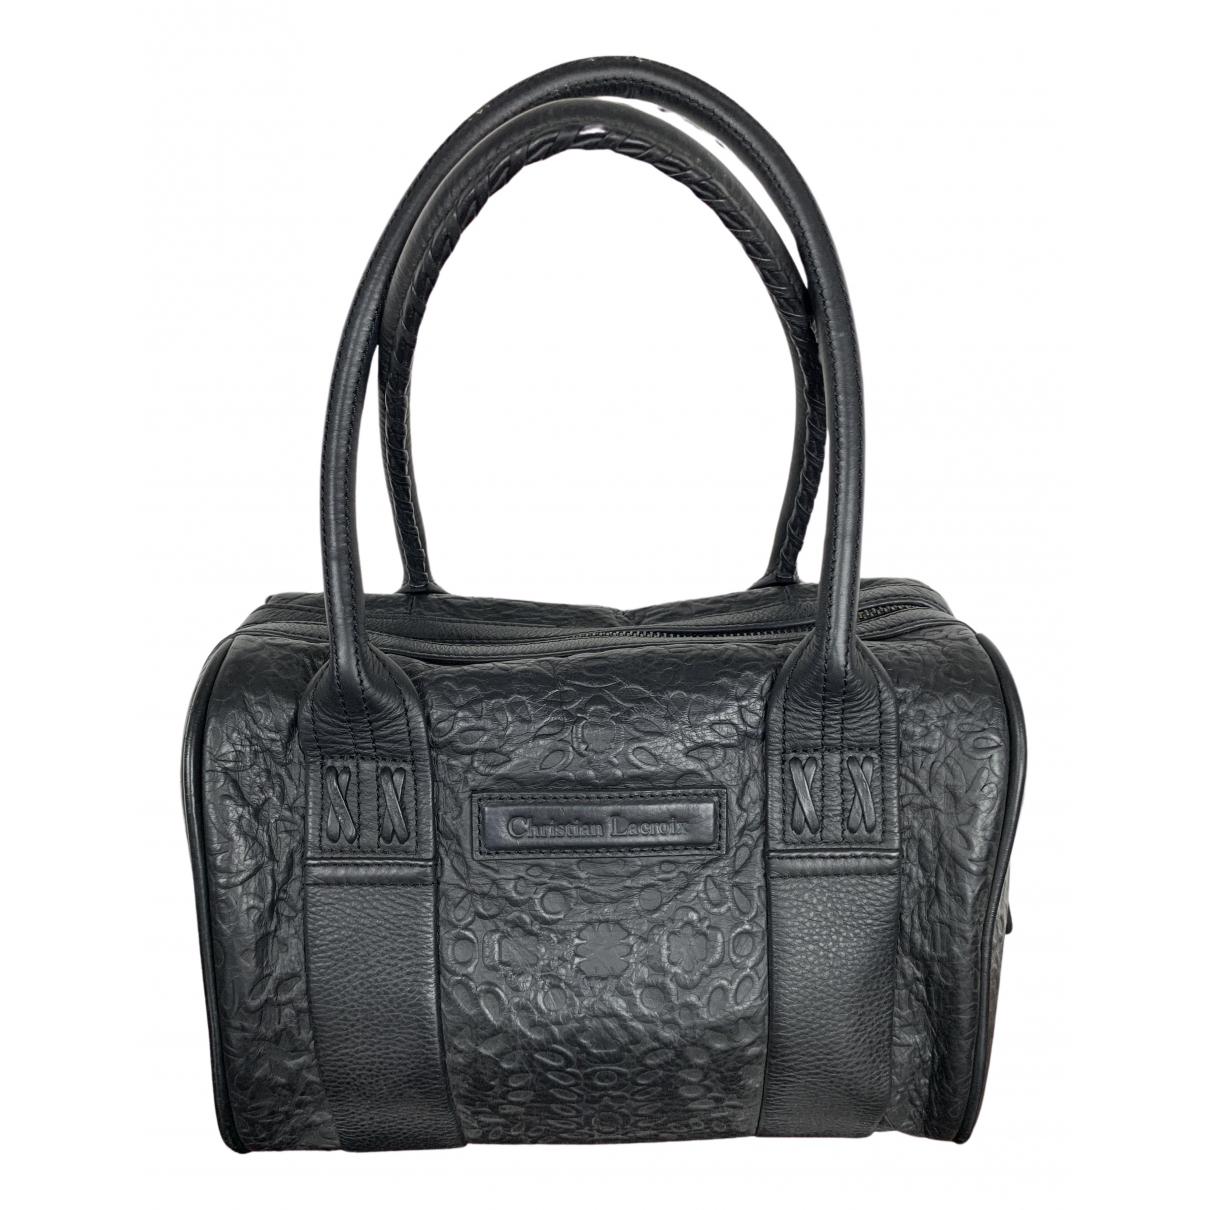 Christian Lacroix \N Handtasche in  Schwarz Leder